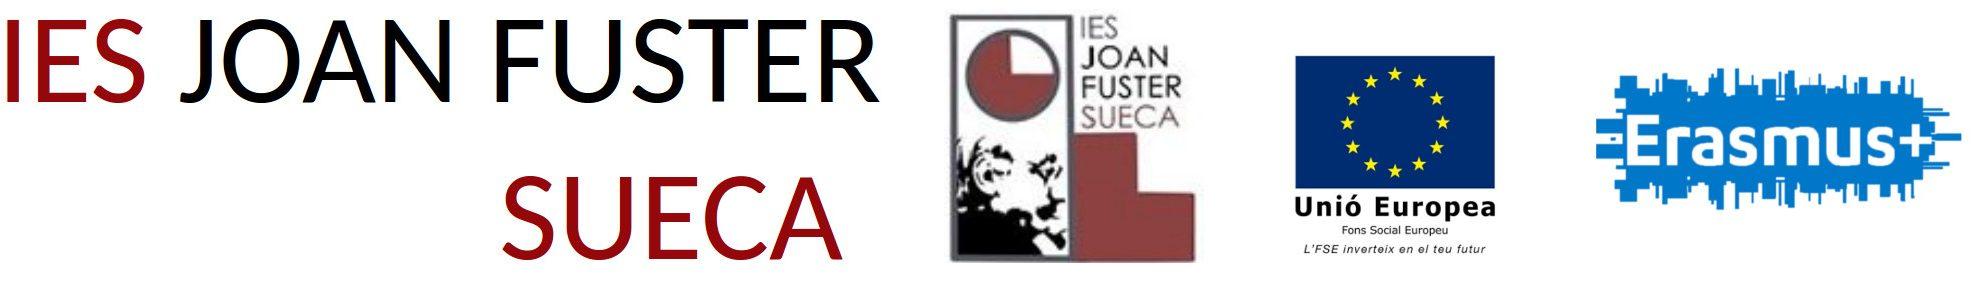 IES JOAN FUSTER SUECA